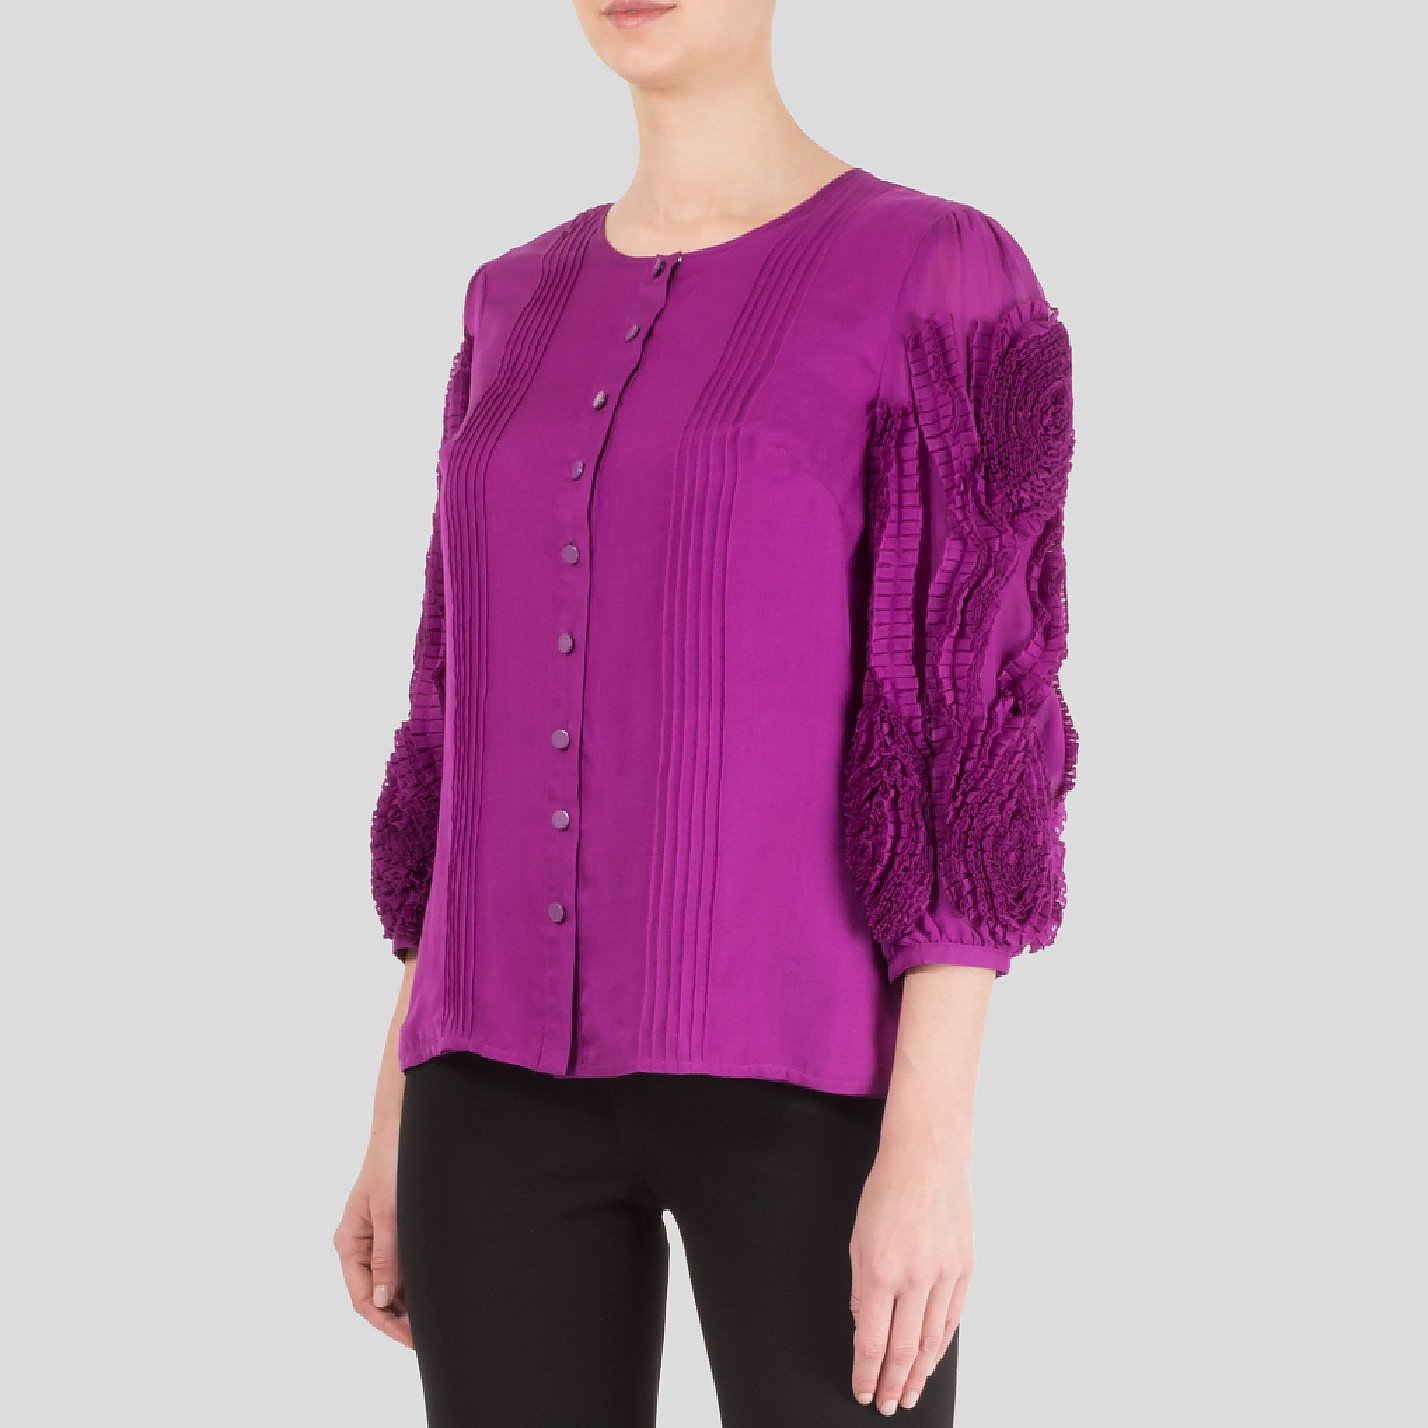 Catherine Malandrino Silk Shirt With Ruffled Sleeves